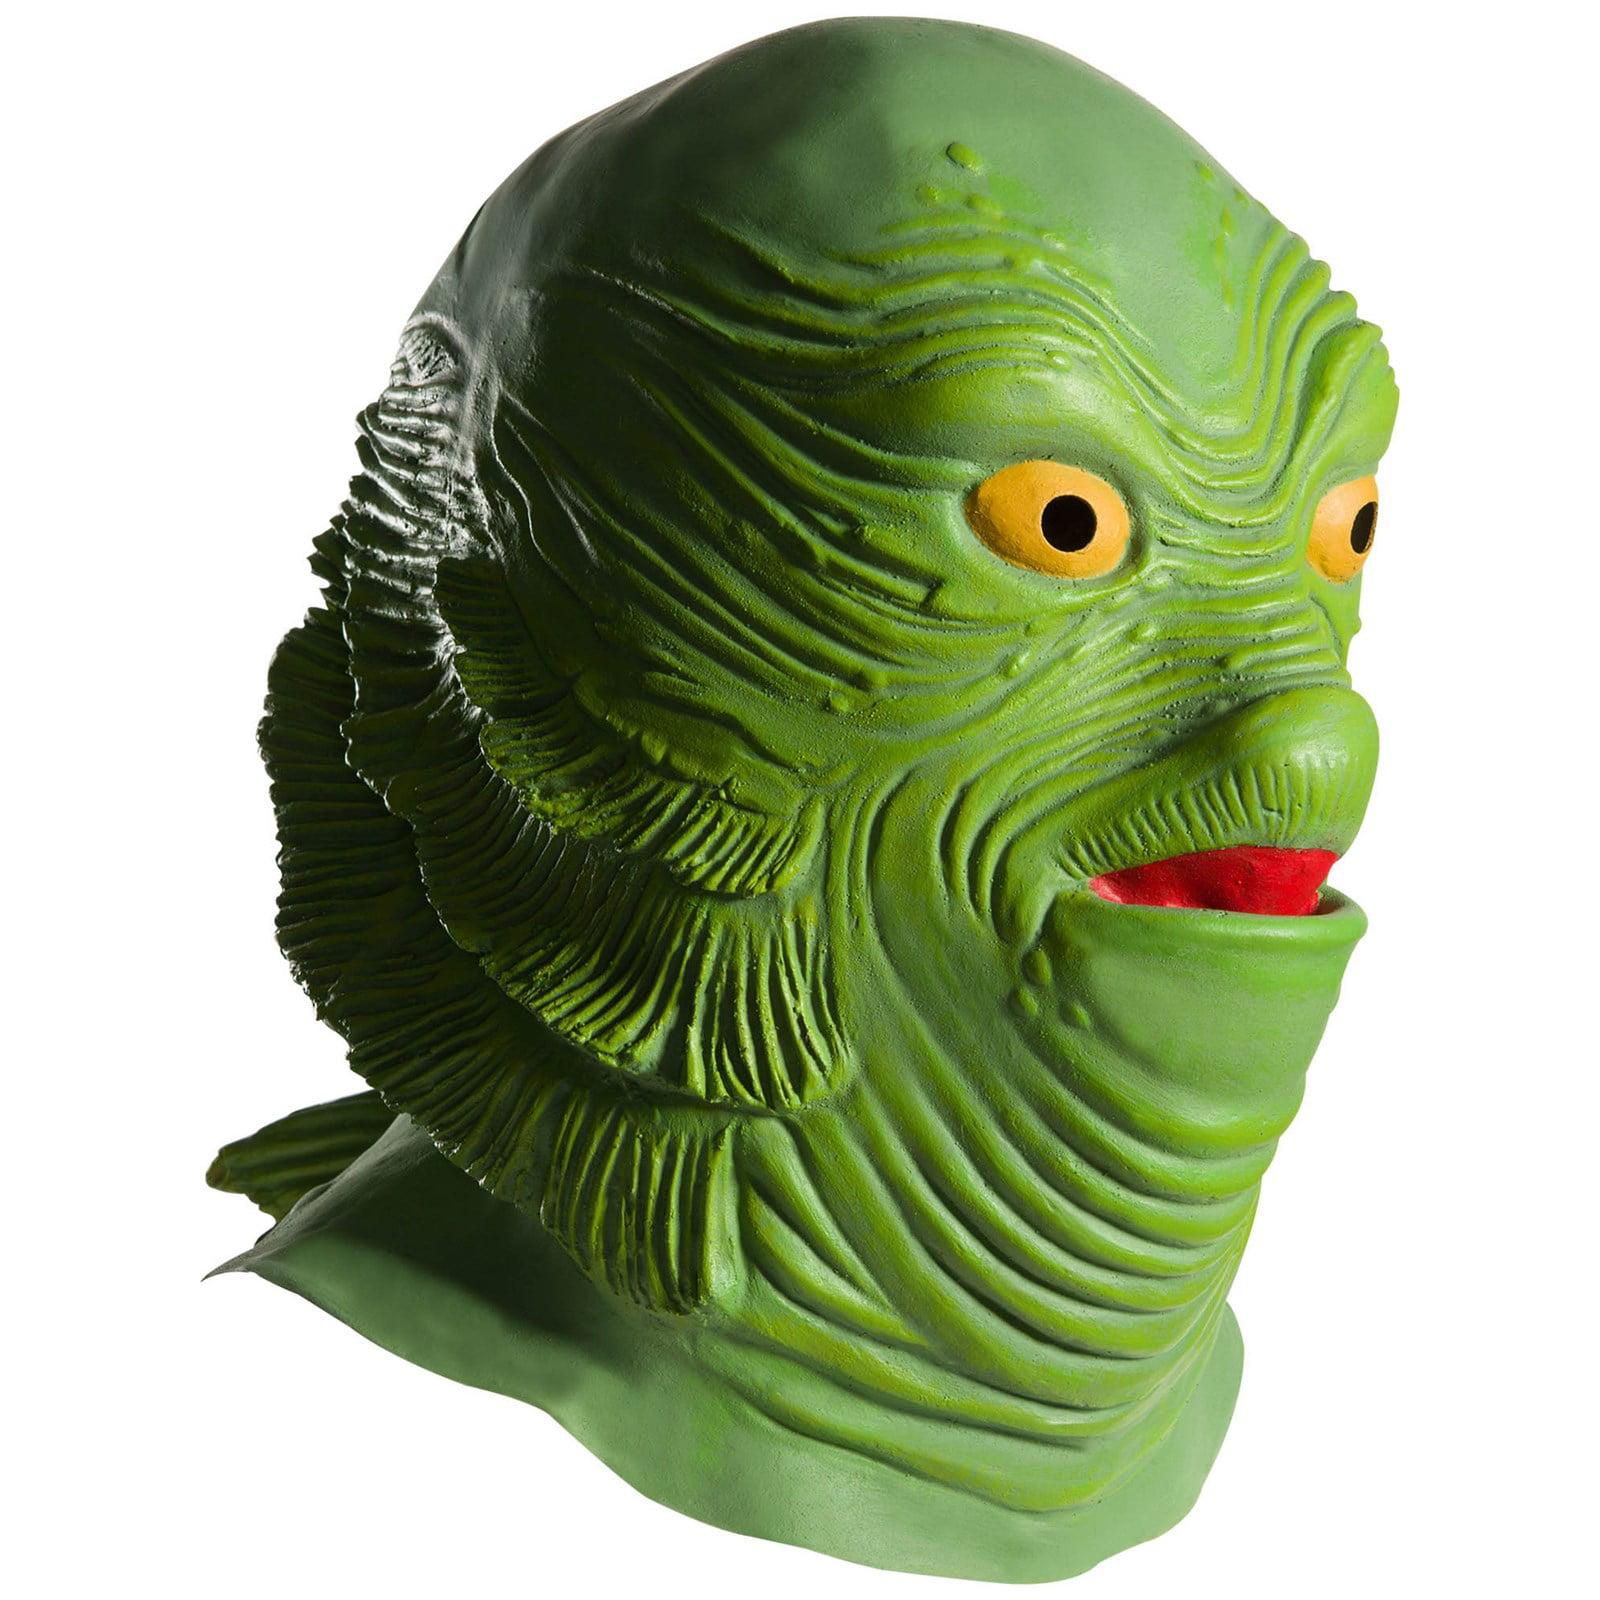 Universal Monsters Creature From The Black Lagoon Overhead Vinyl Mask Halloween Costume Accessory Walmart Com Walmart Com